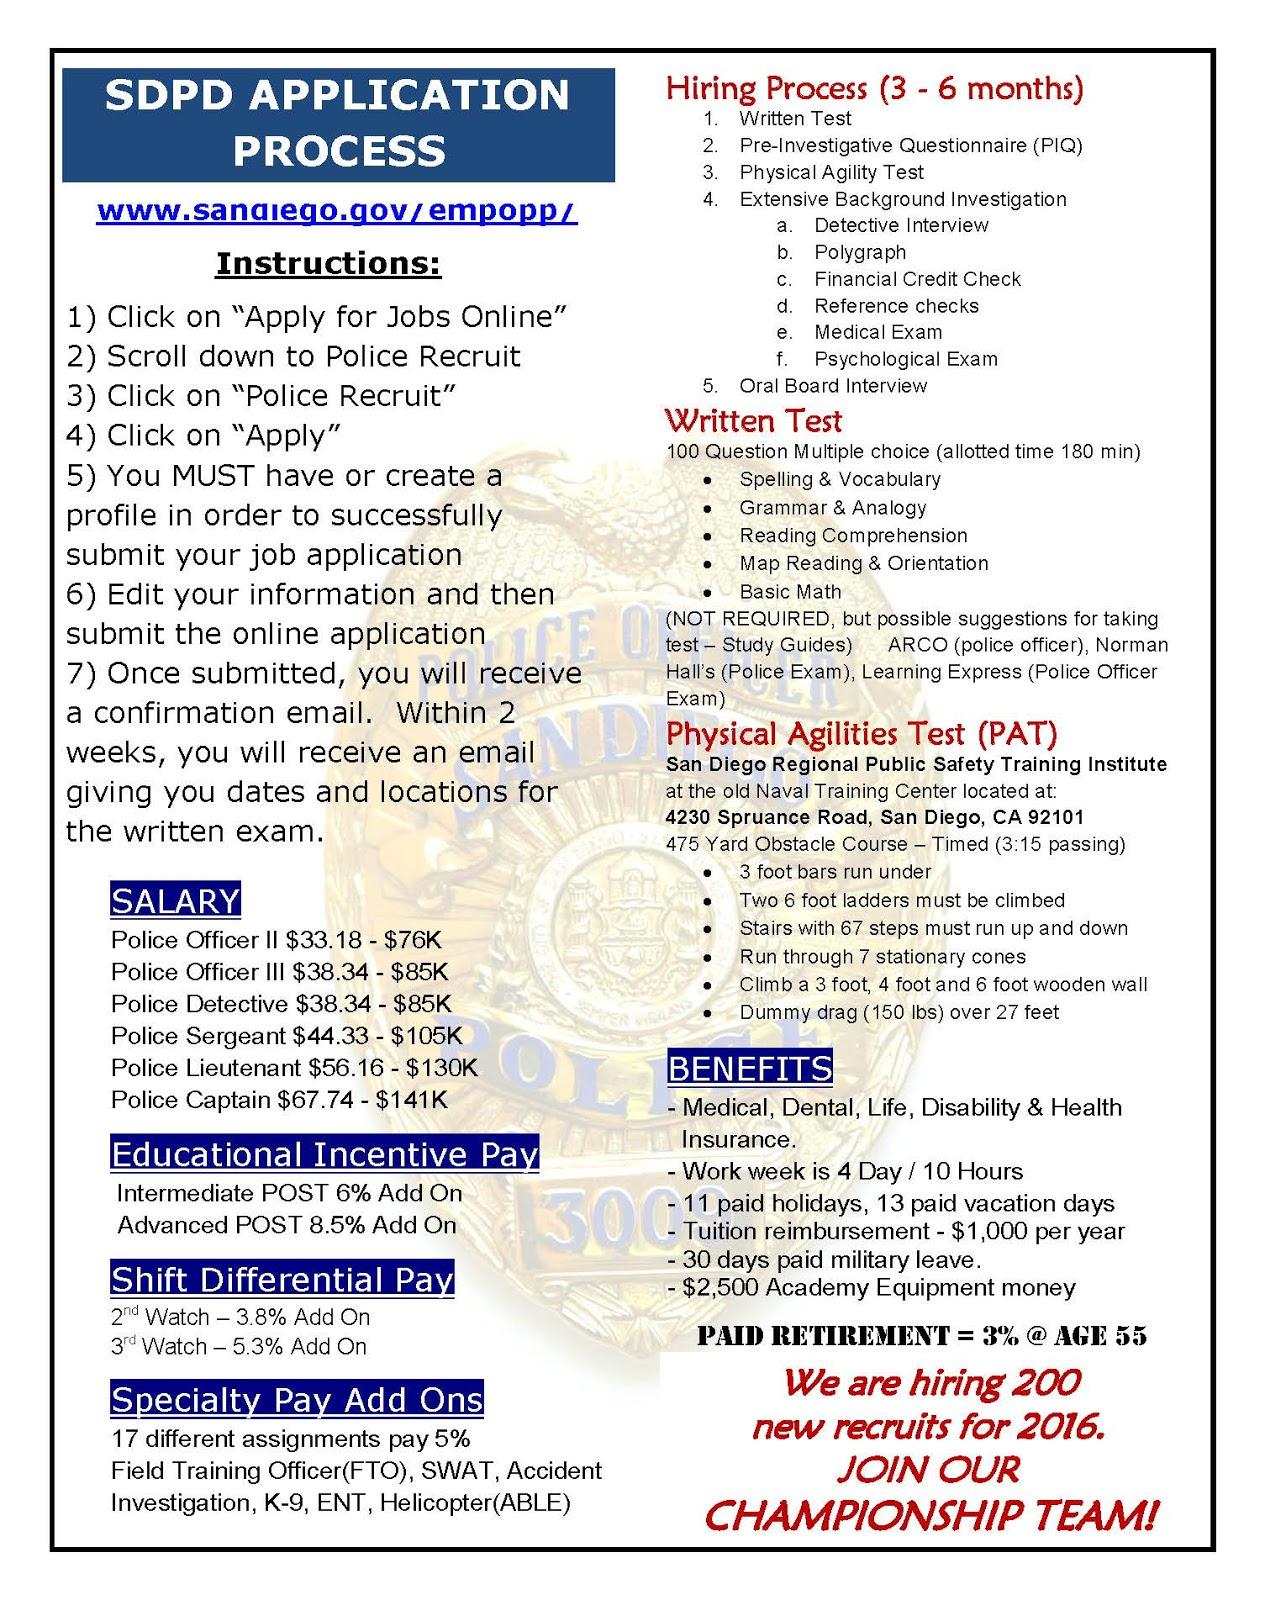 CCJS Undergrad Blog: August 2015